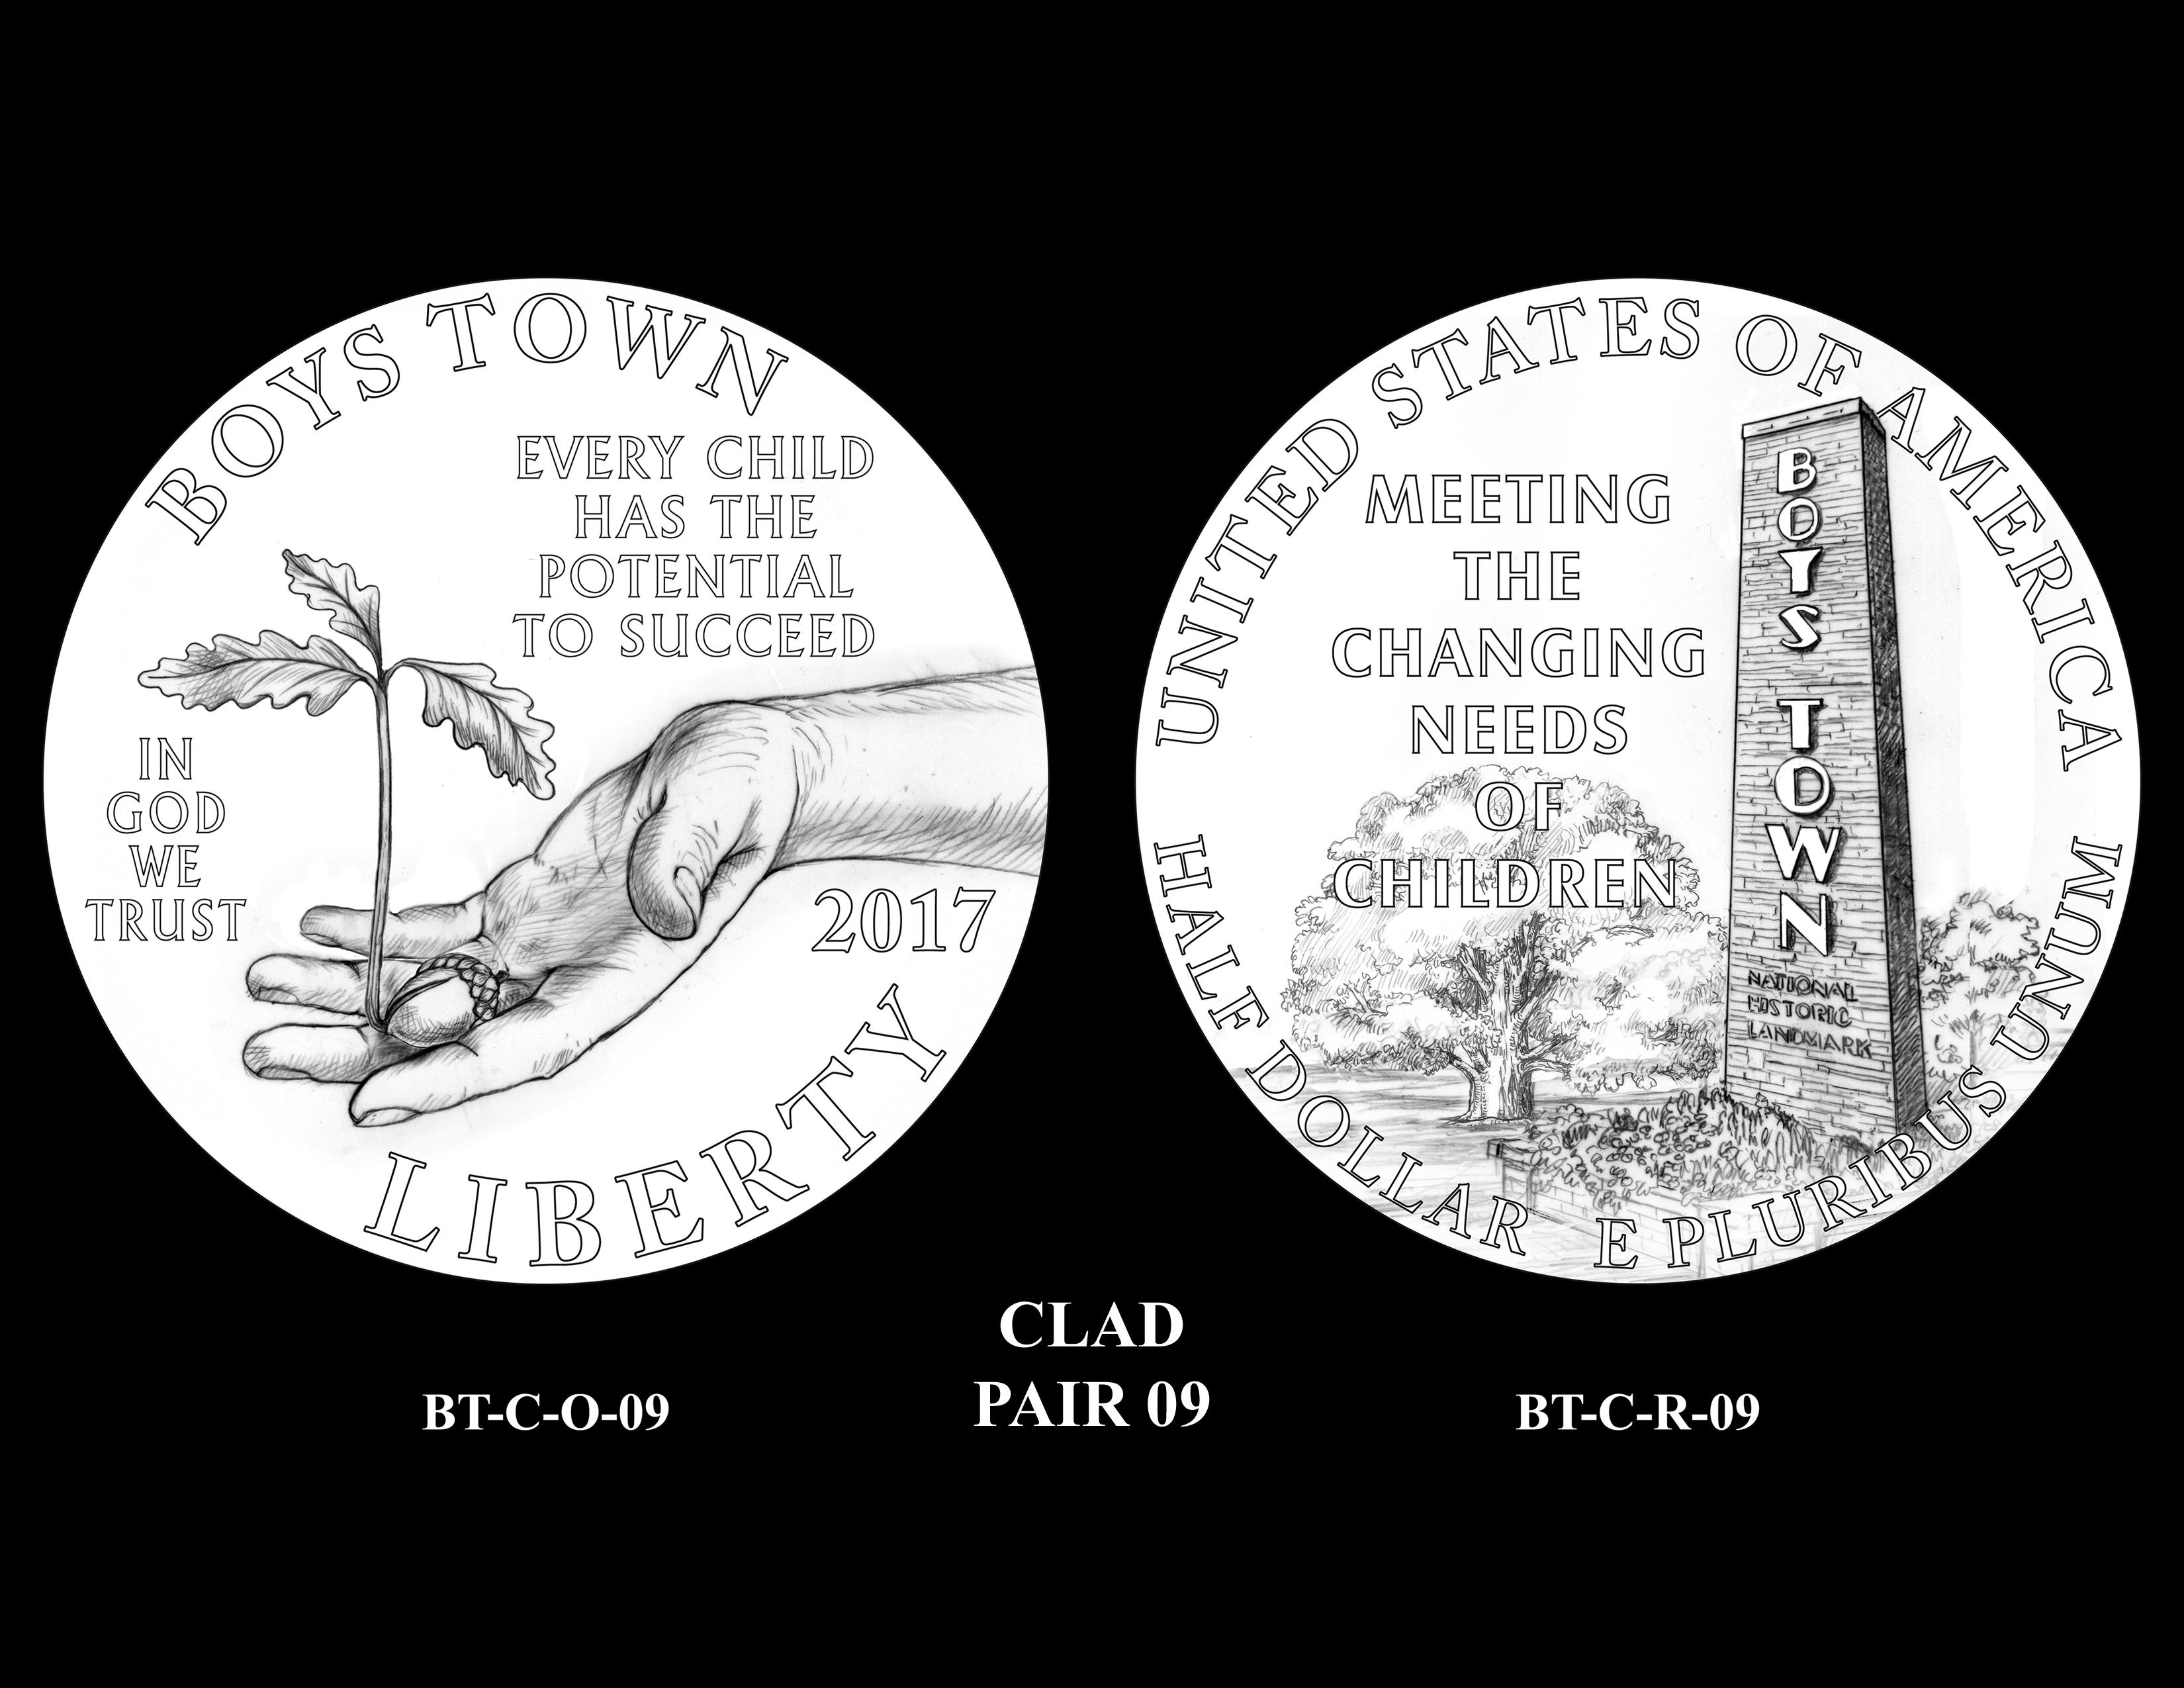 Clad-Pair-09 -- 2017 Boystown Centennial Commemorative Coin  Program